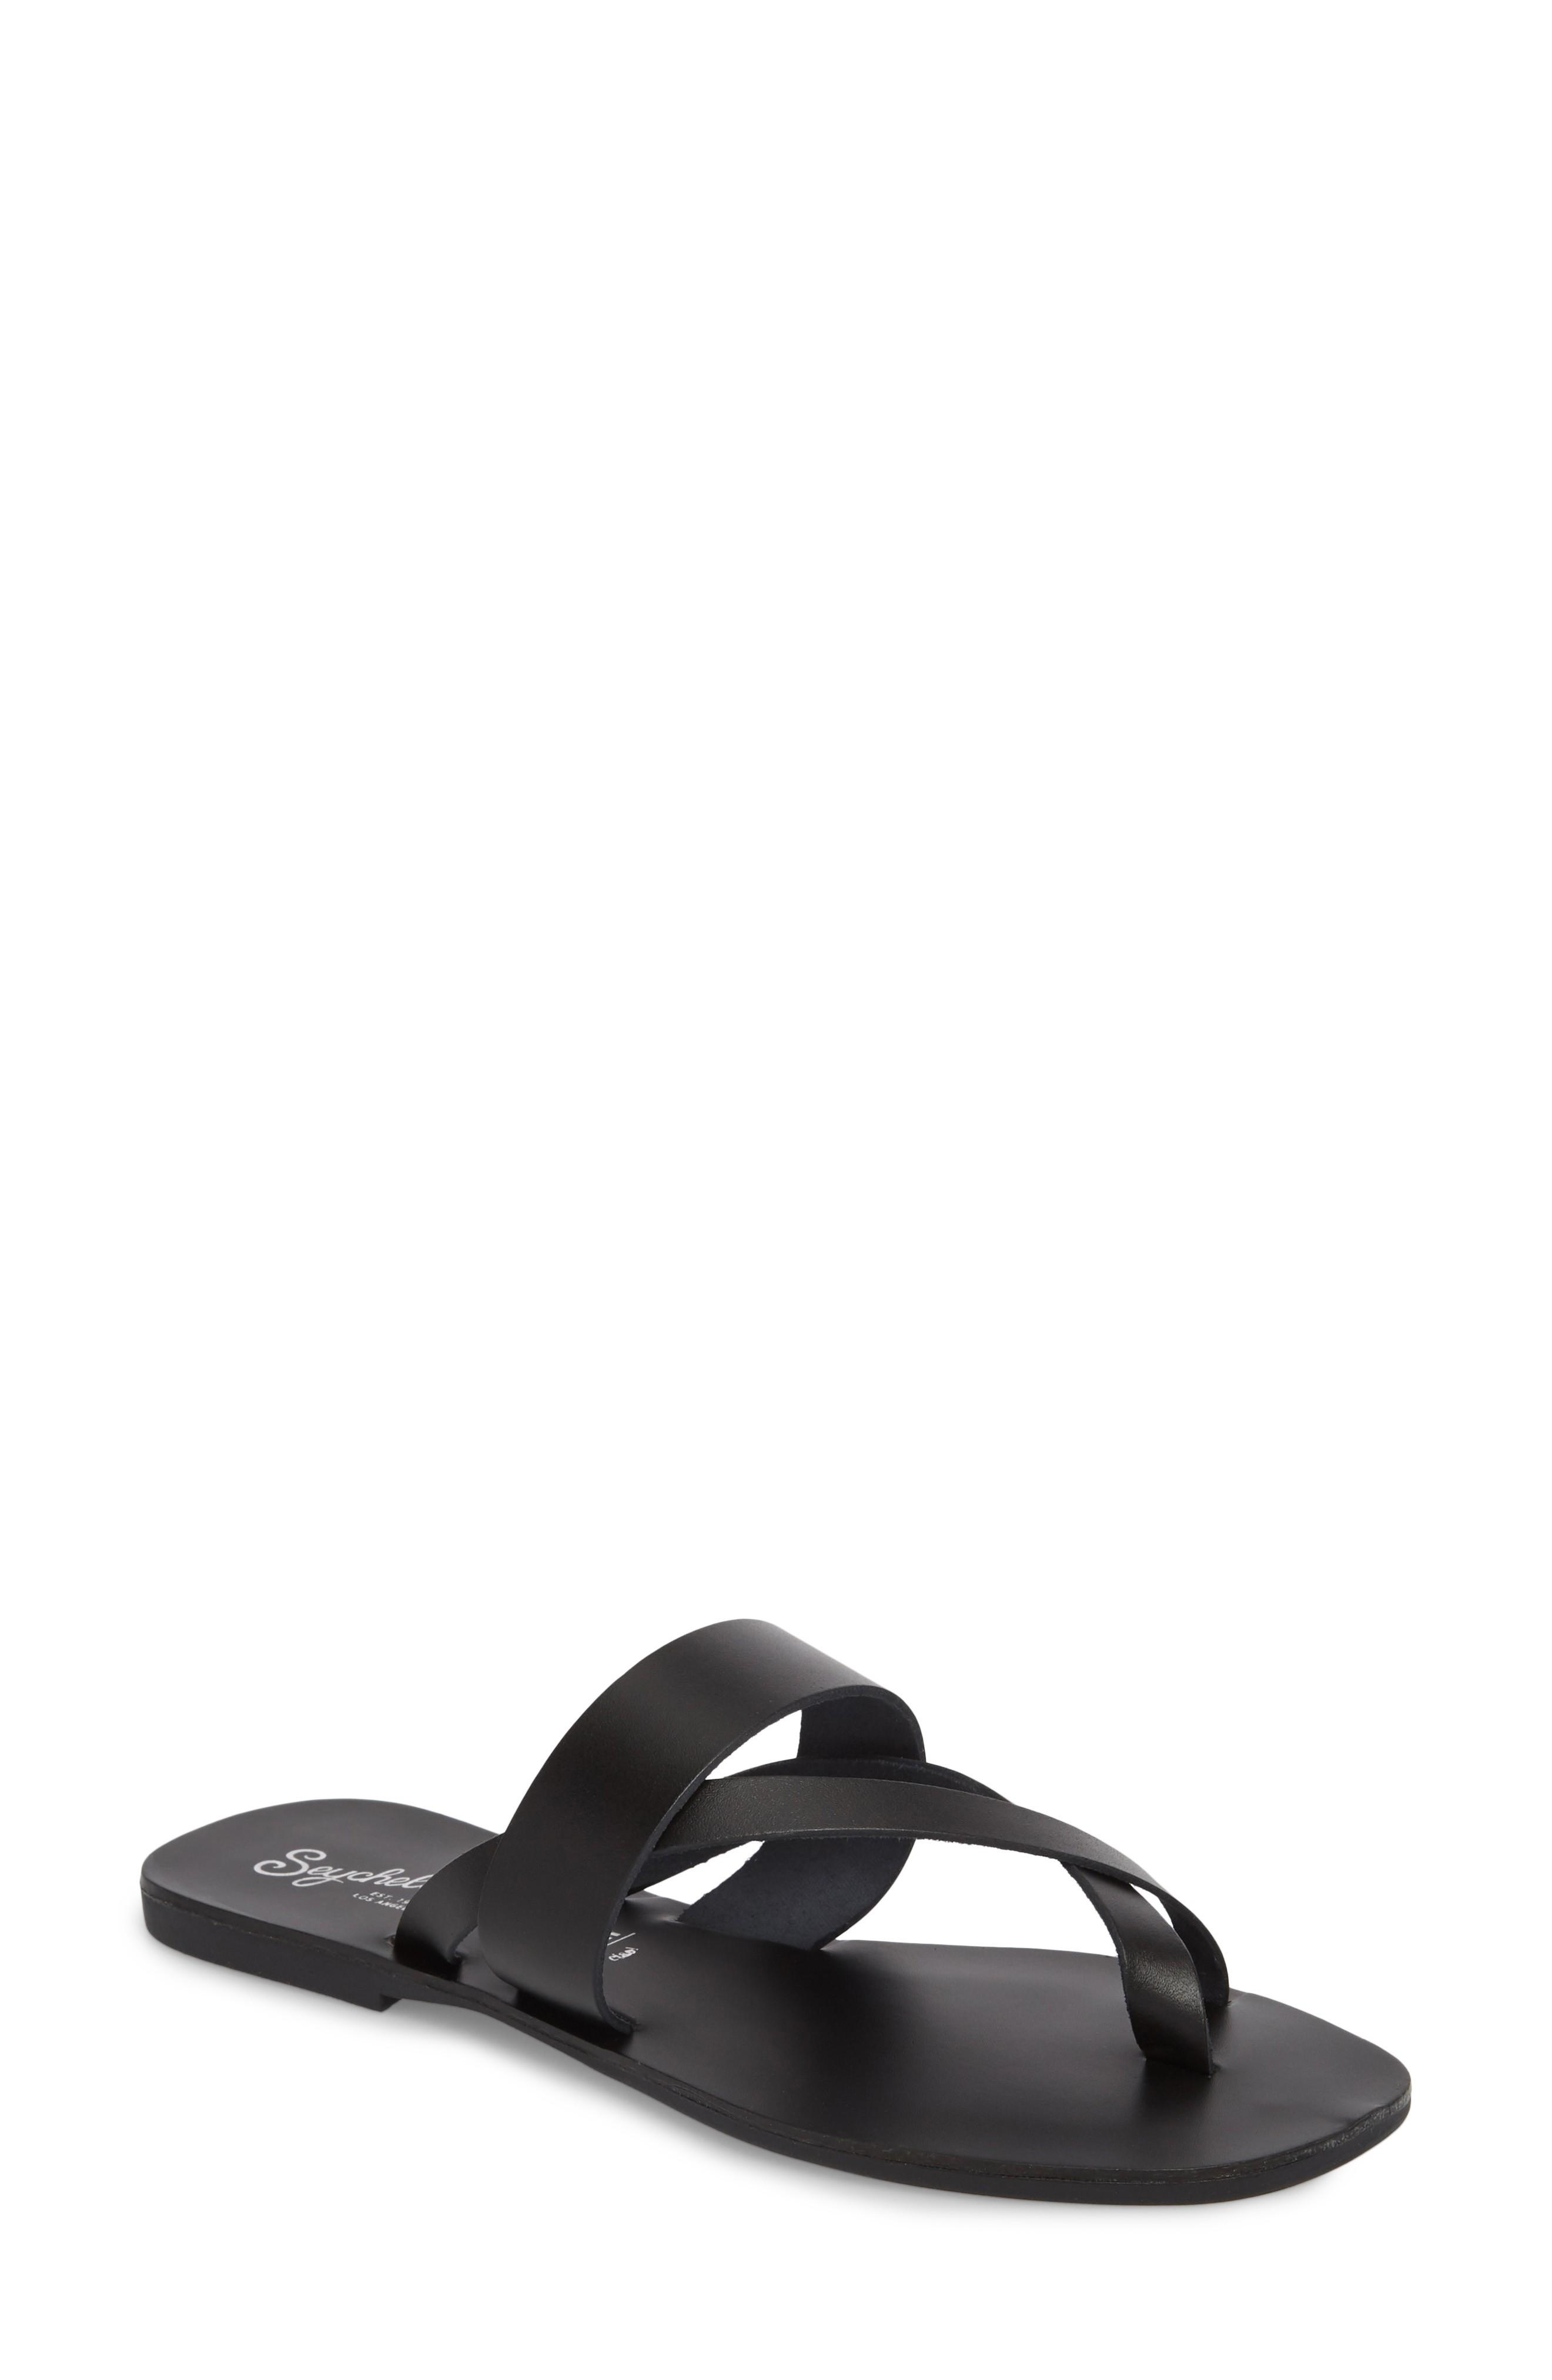 5435be6942c1 Seychelles Destiny Thong Sandal In Black Leather